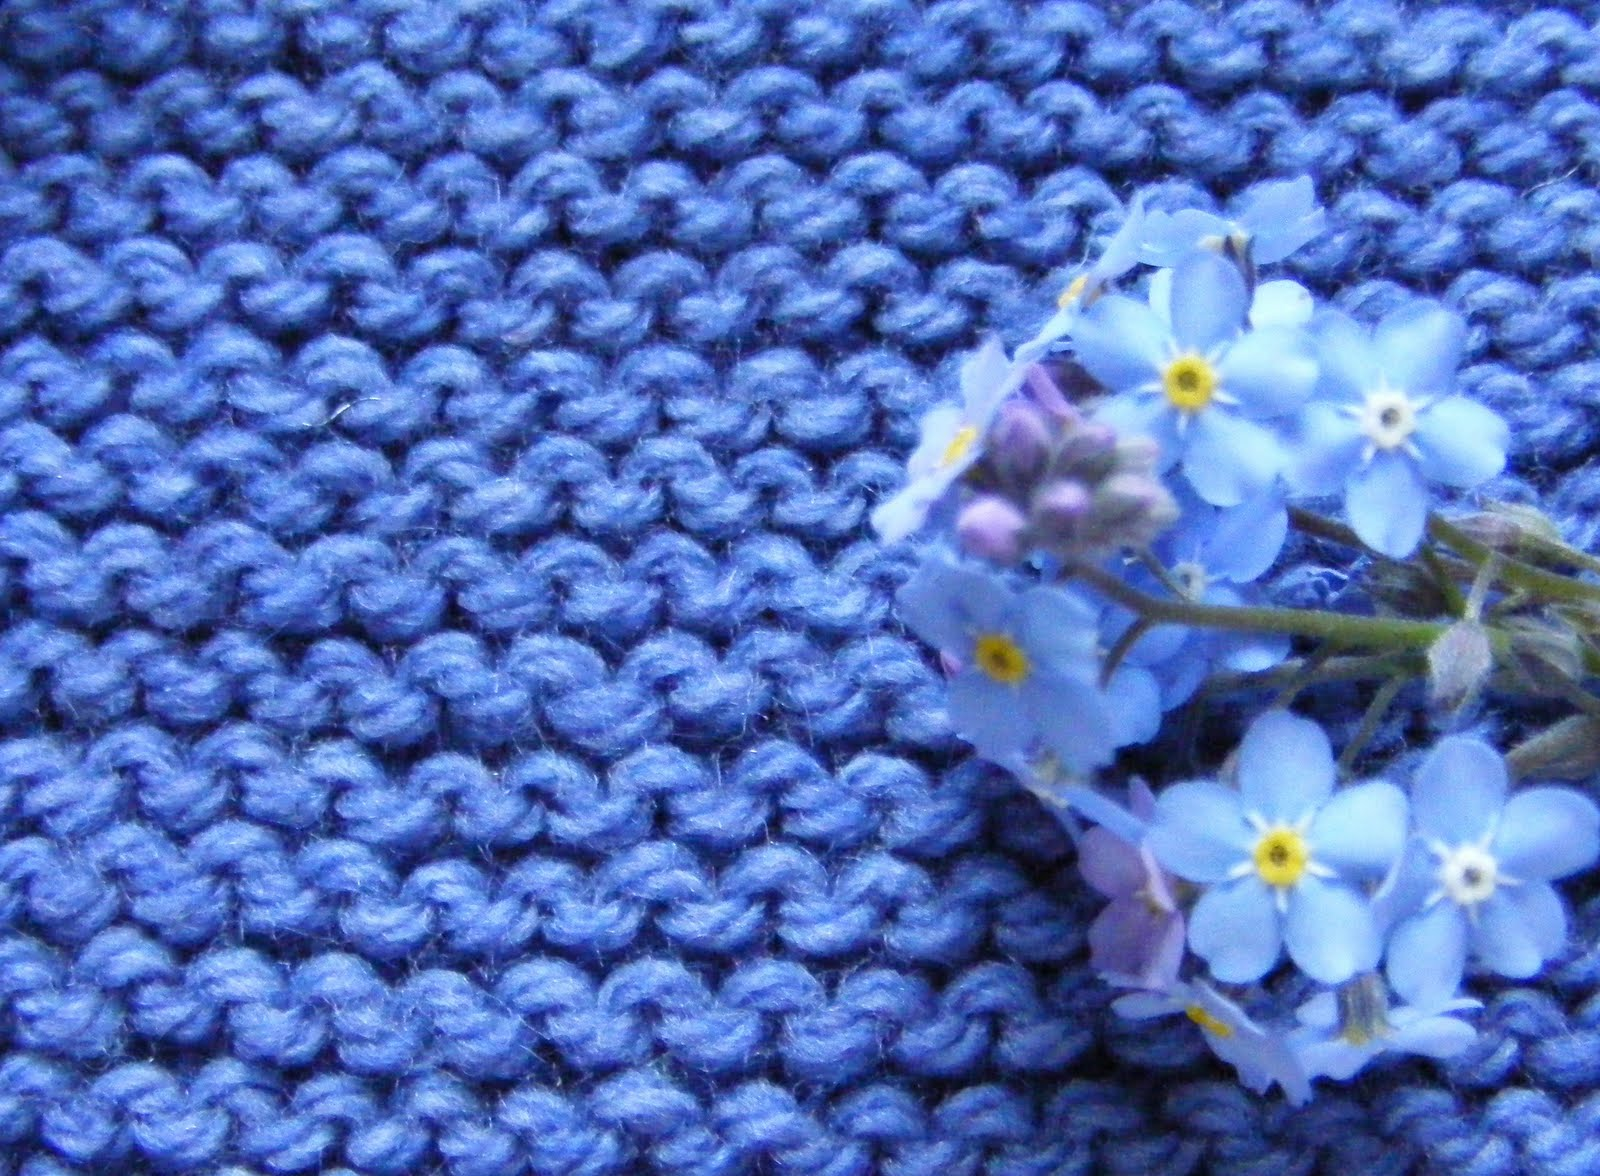 Knitting Stitches Purl Stitch Beginners : Chalk Cottage Knitting: Beginners Purl stitch